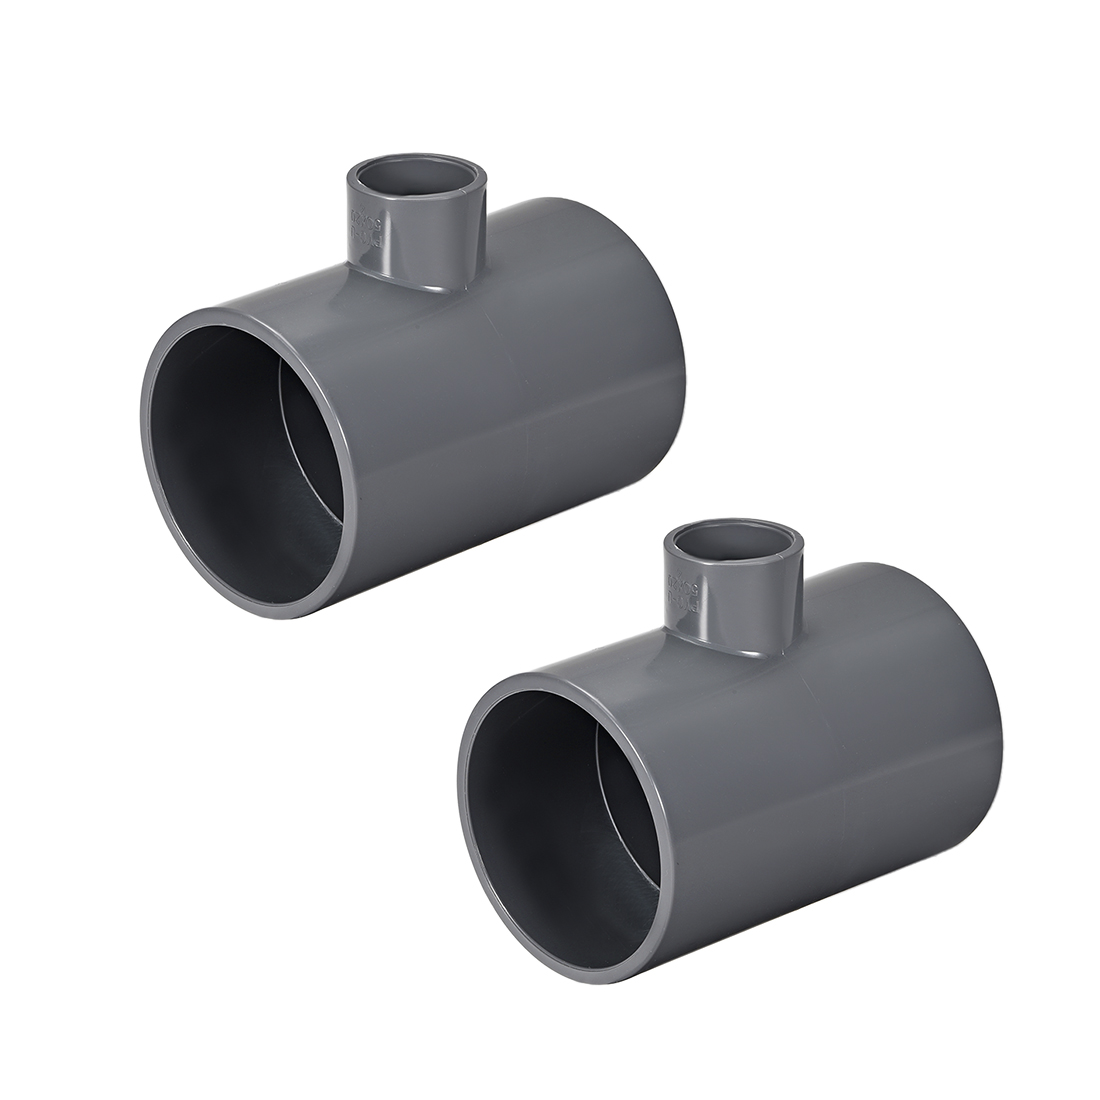 PVC Pipe Fitting Tee 401-Series Gray 3/4-inch X 2-inch Socket 2pcs